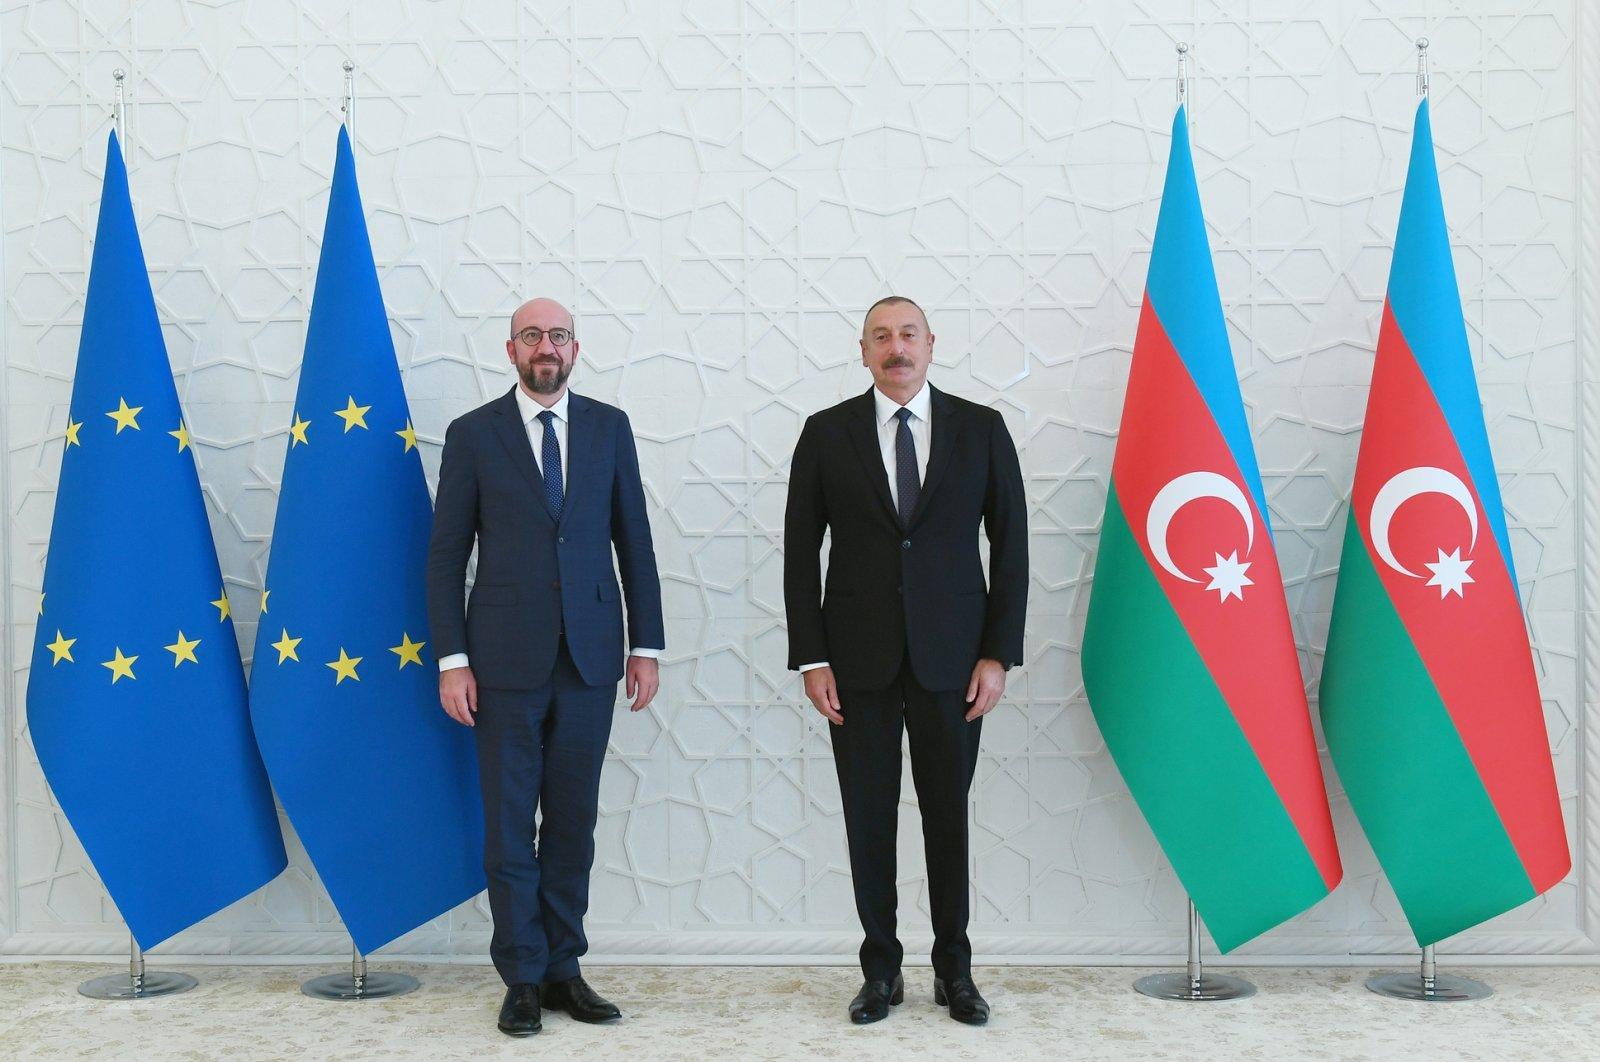 Azerbaijan's Ilham Aliyev (R) is seen together with EU Council head Charles Michel in the capital Baku, July 18, 2021 (AA Photo)